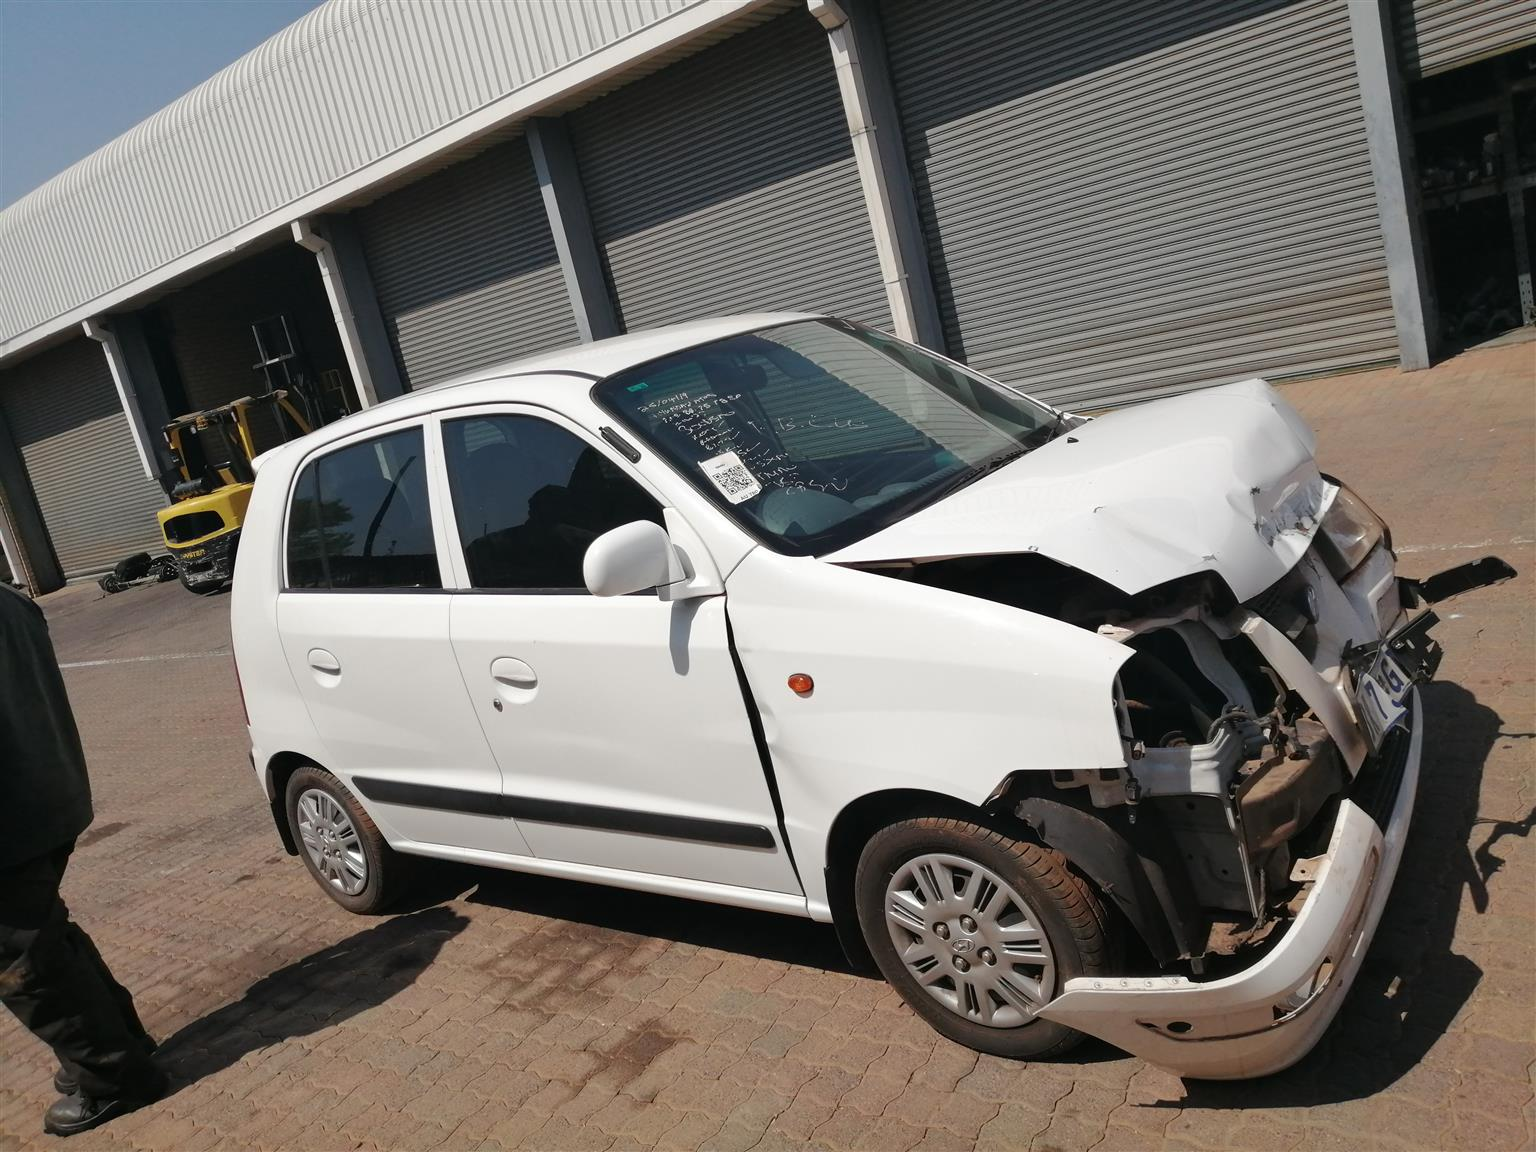 Hyundai Atos Prime Spare Parts For Sale